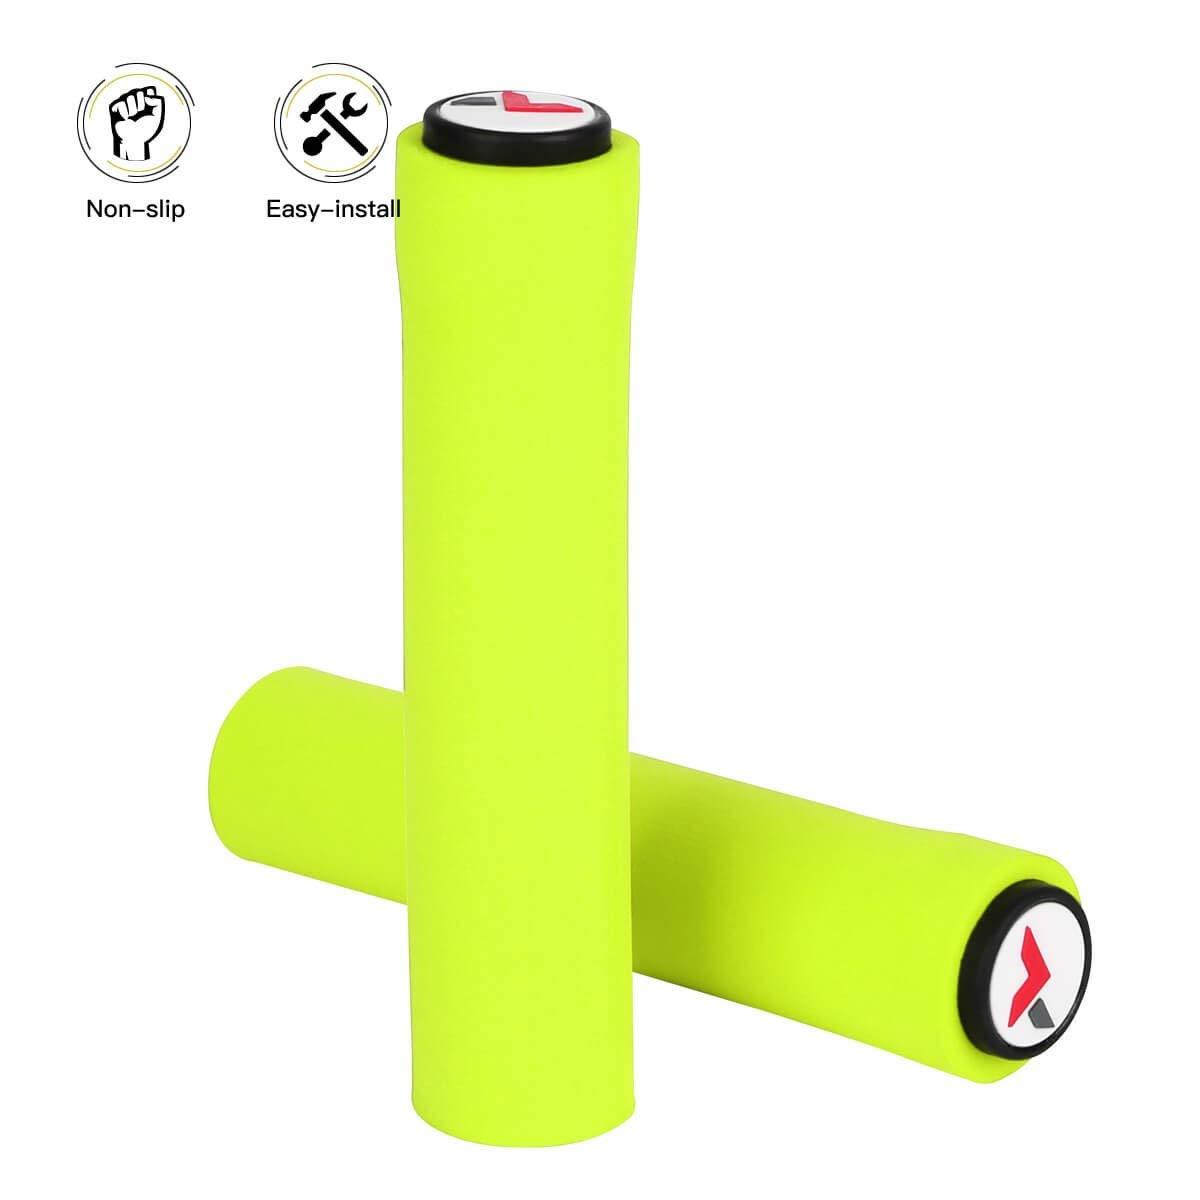 Anti-Slip CNC Aluminum Rubber Bike Bicycle Handle Bar for Bike Bicycle VGEBY Handlebar Grips